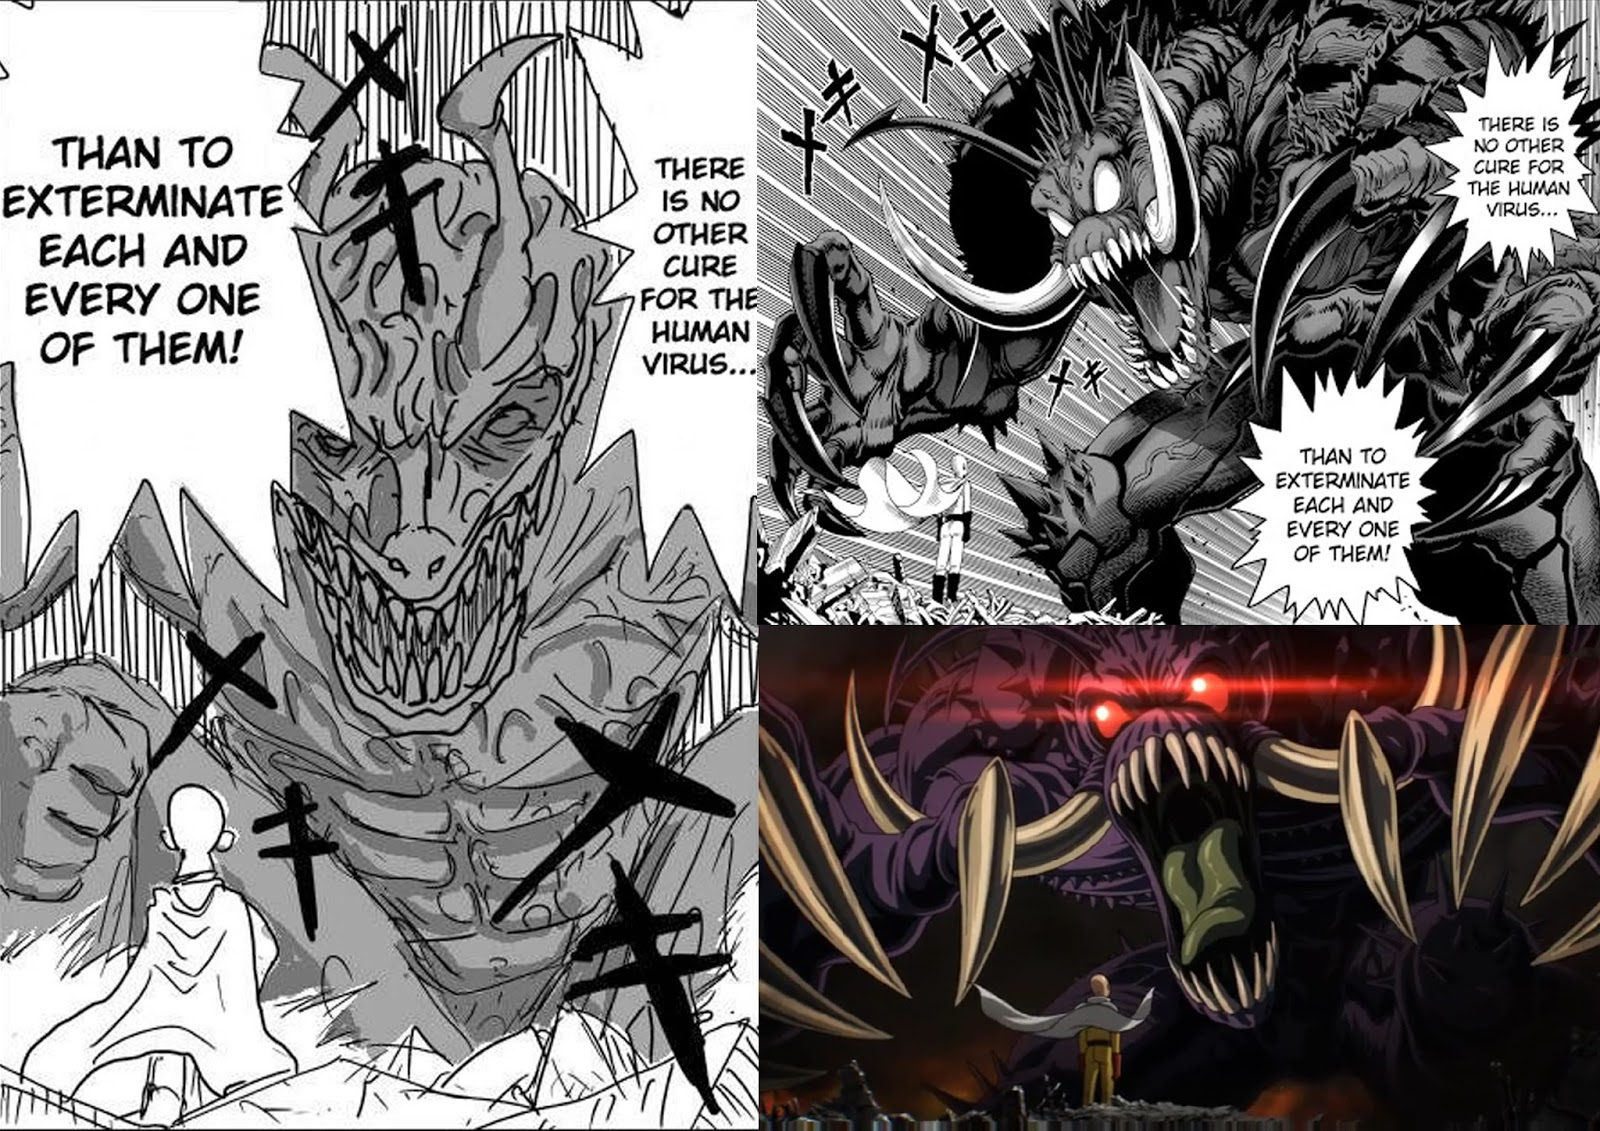 Vs manga one man comparison webcomic punch One Punch